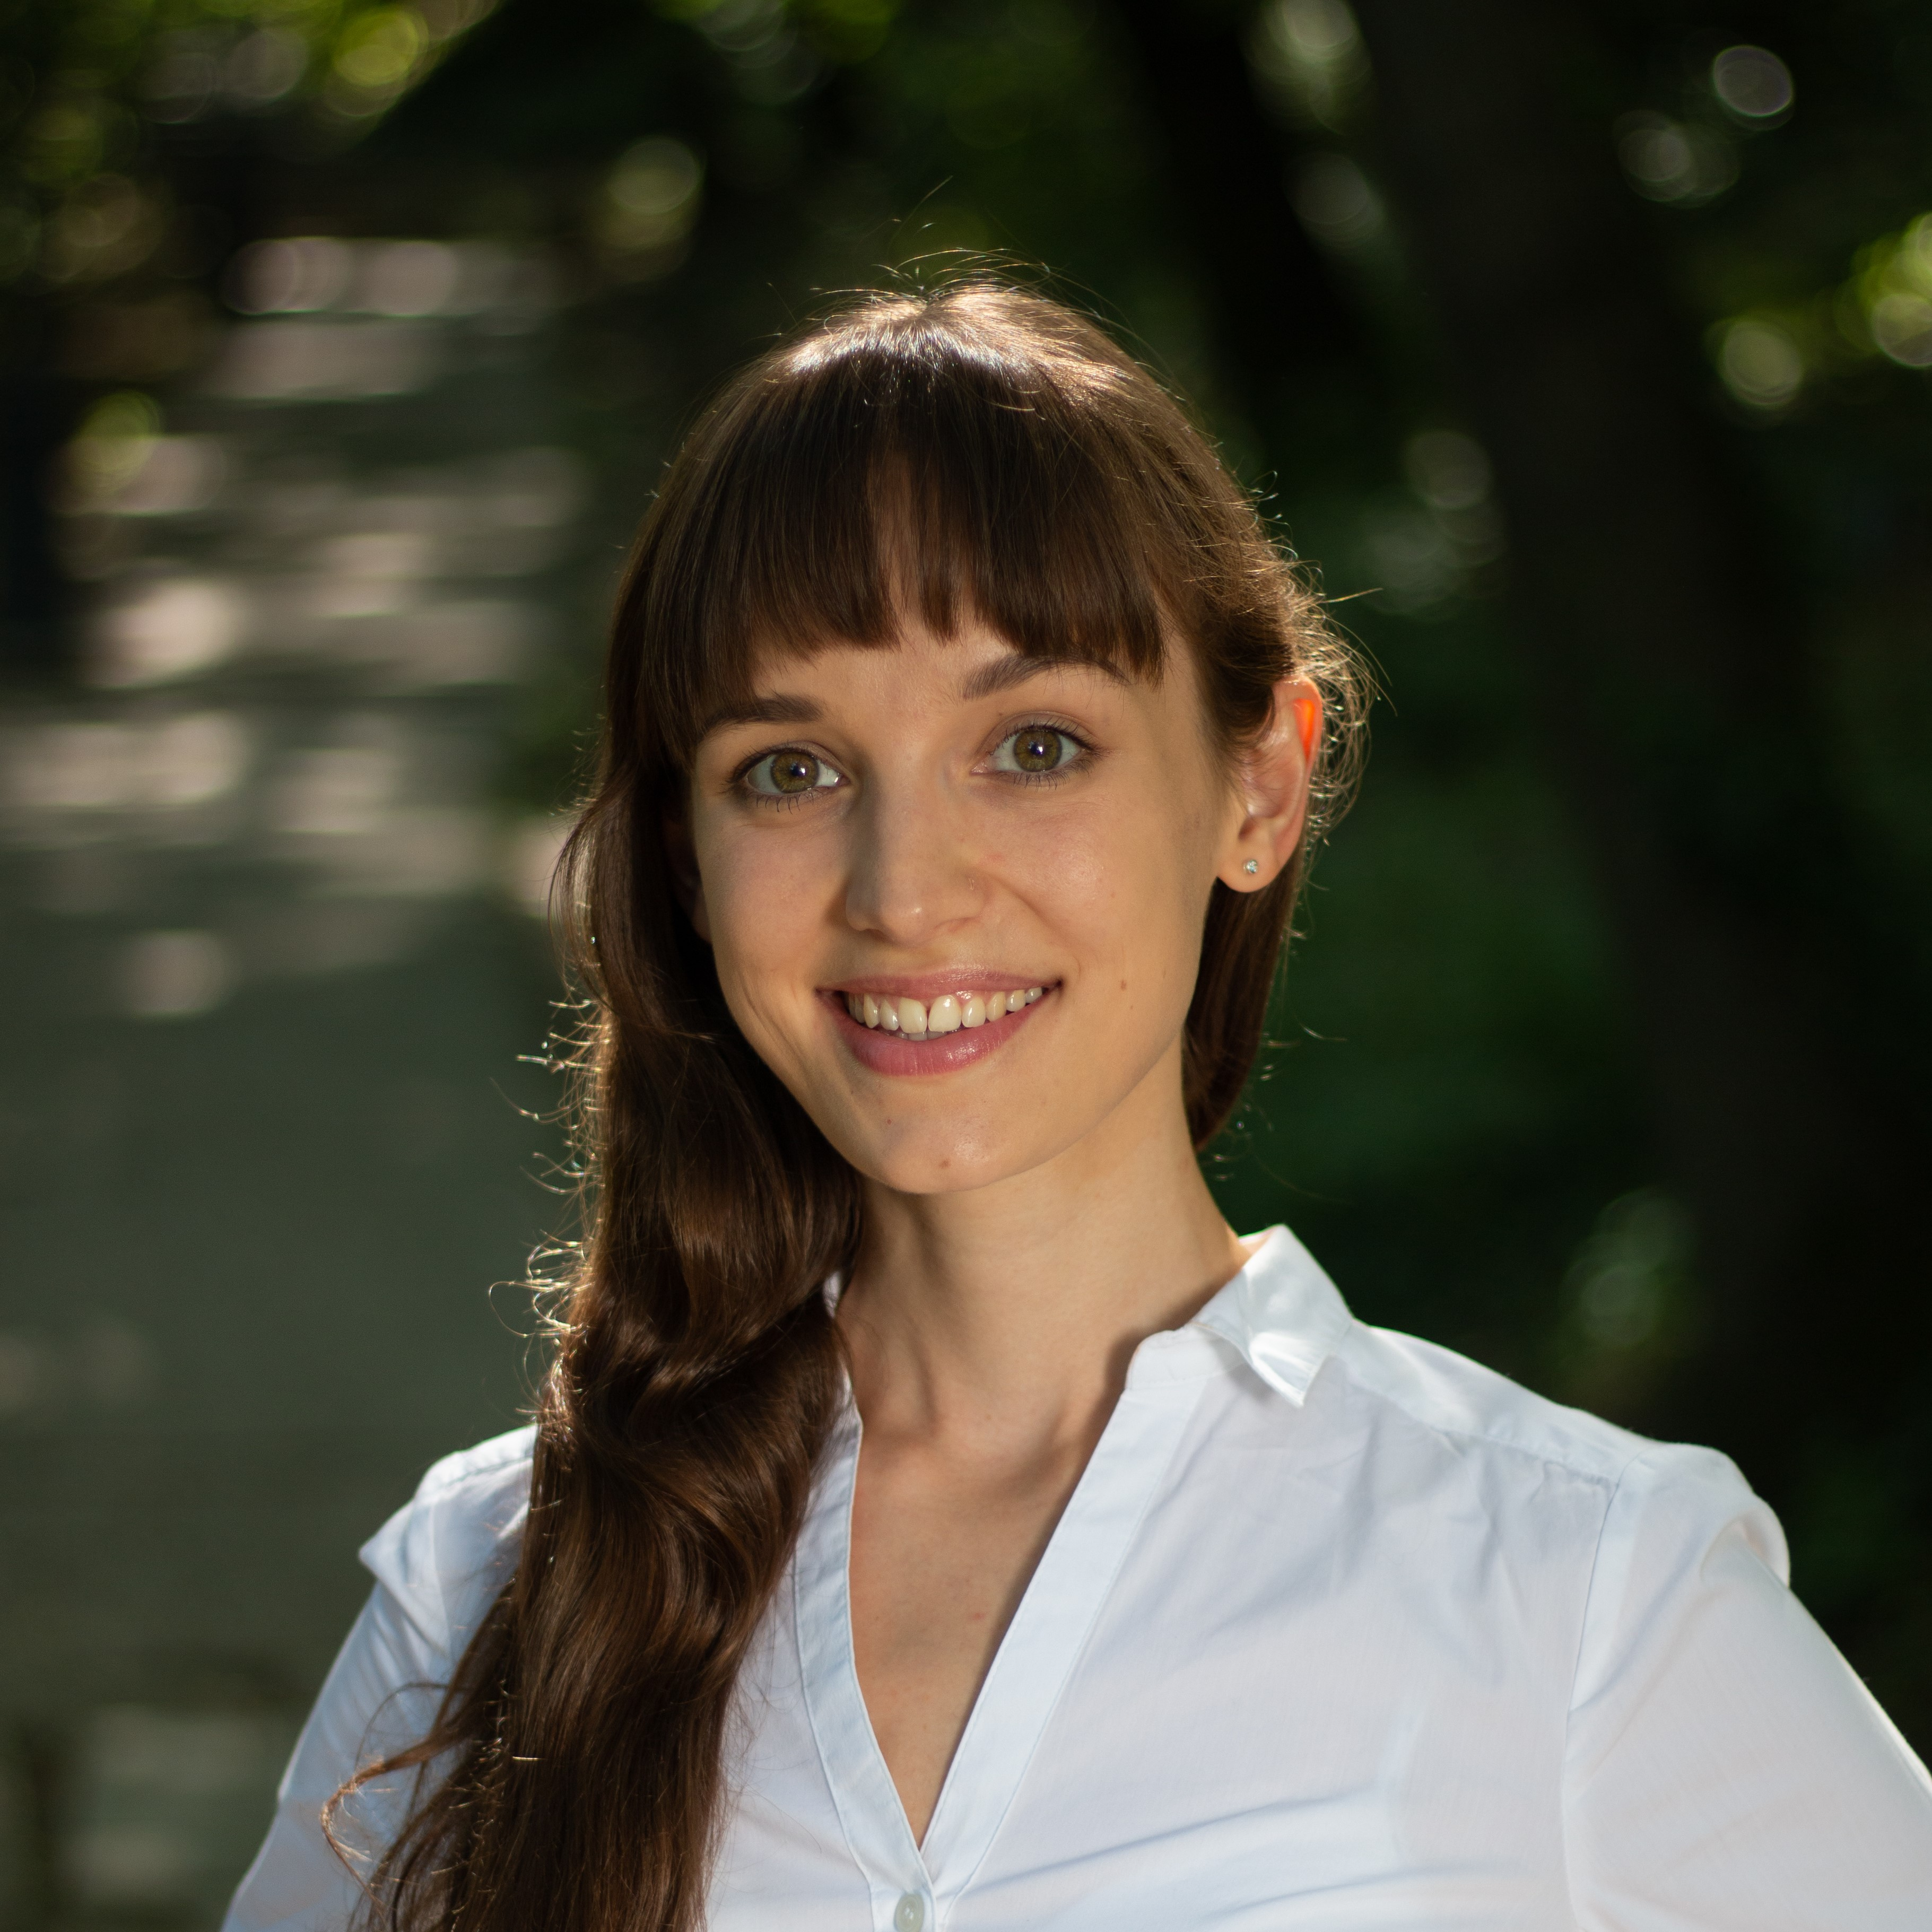 Havlik Mercedesz Marketing Specialist at DiabTrend